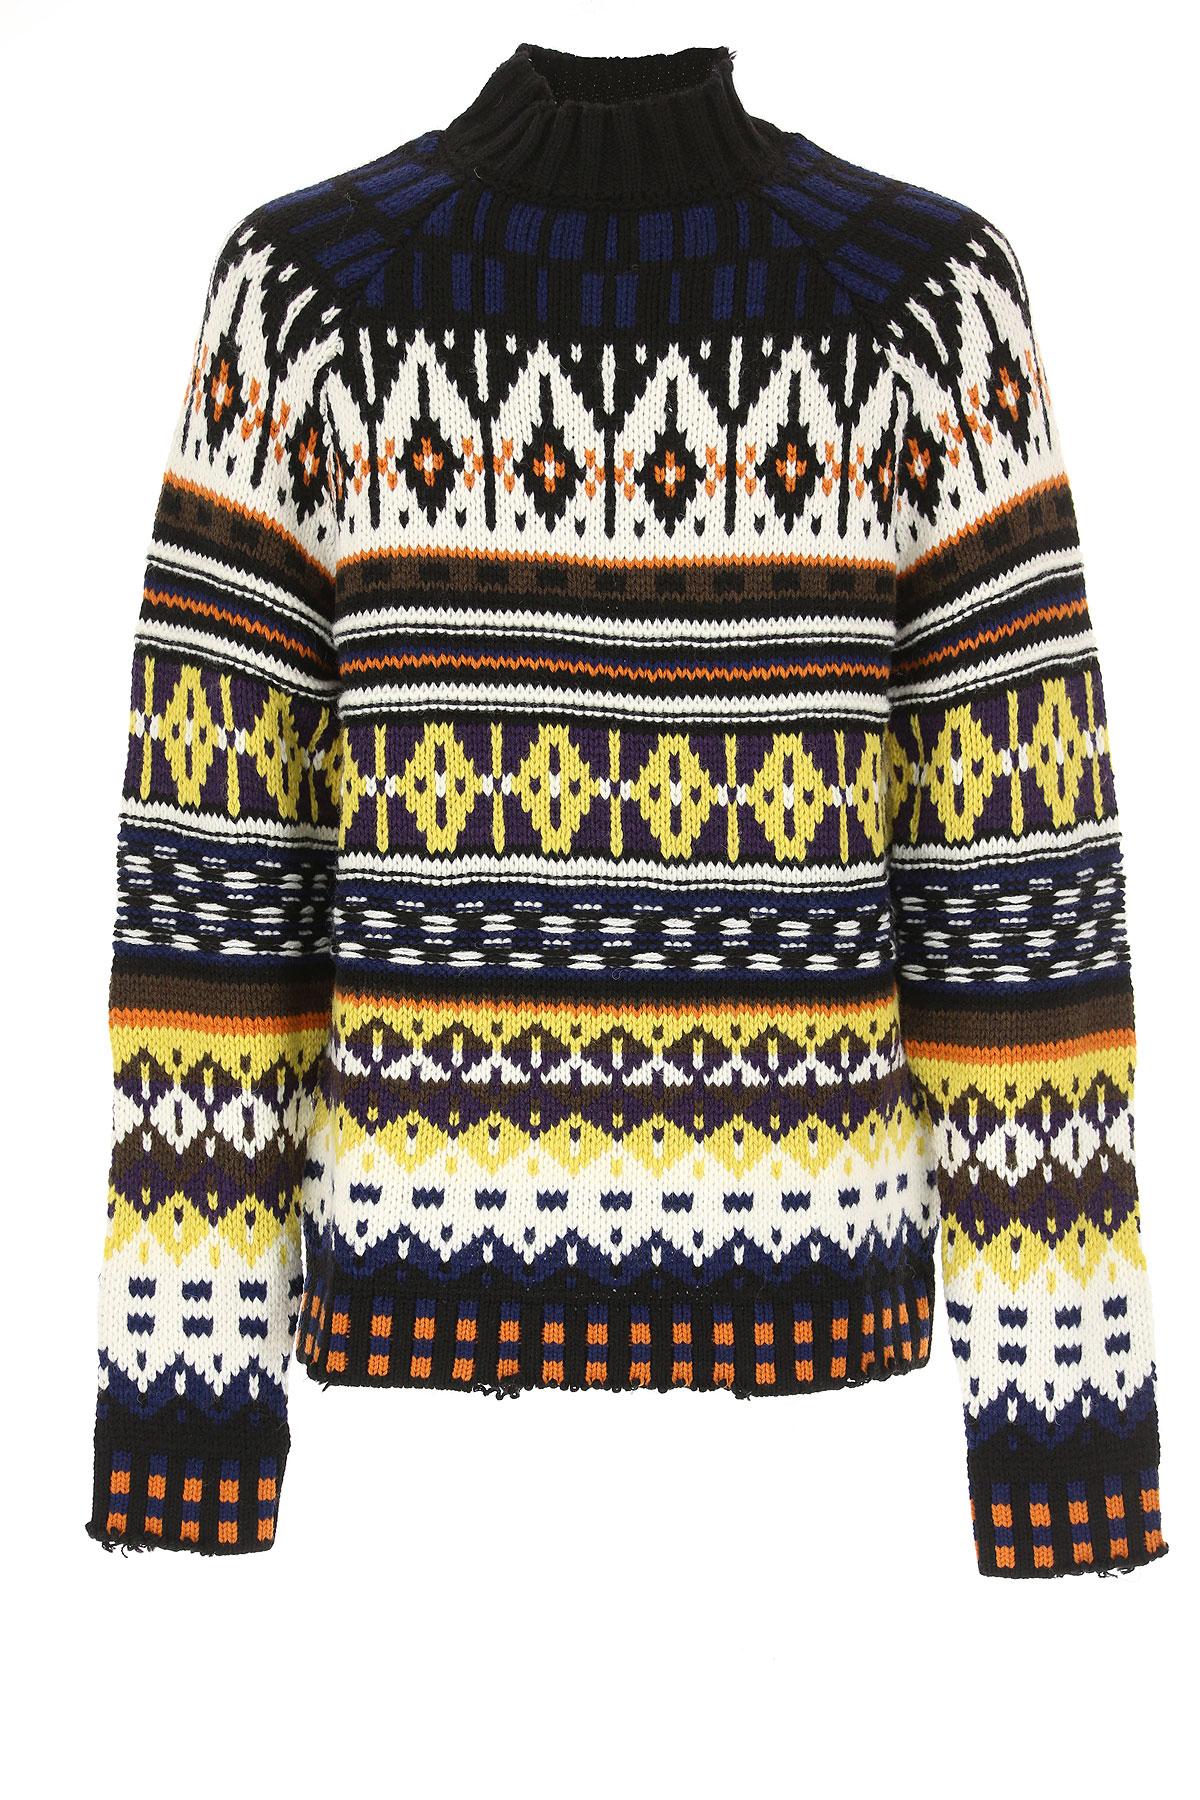 MSGM Sweater for Men Jumper, Multicolor, Acrylic, 2017, M S